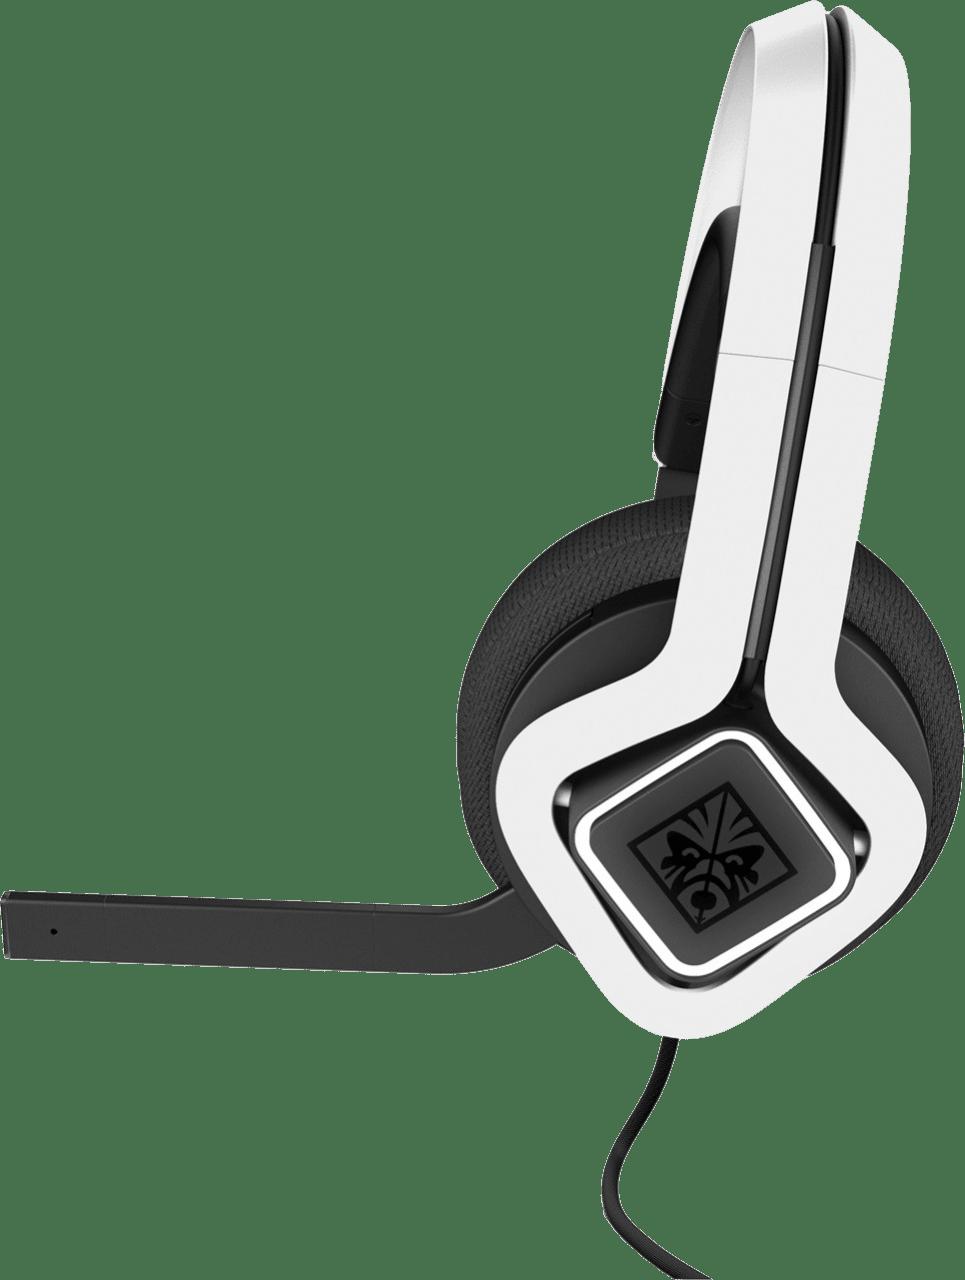 Weiß HP Omen Mindframe 2 Over-Ear-Gaming-Kopfhörer.4